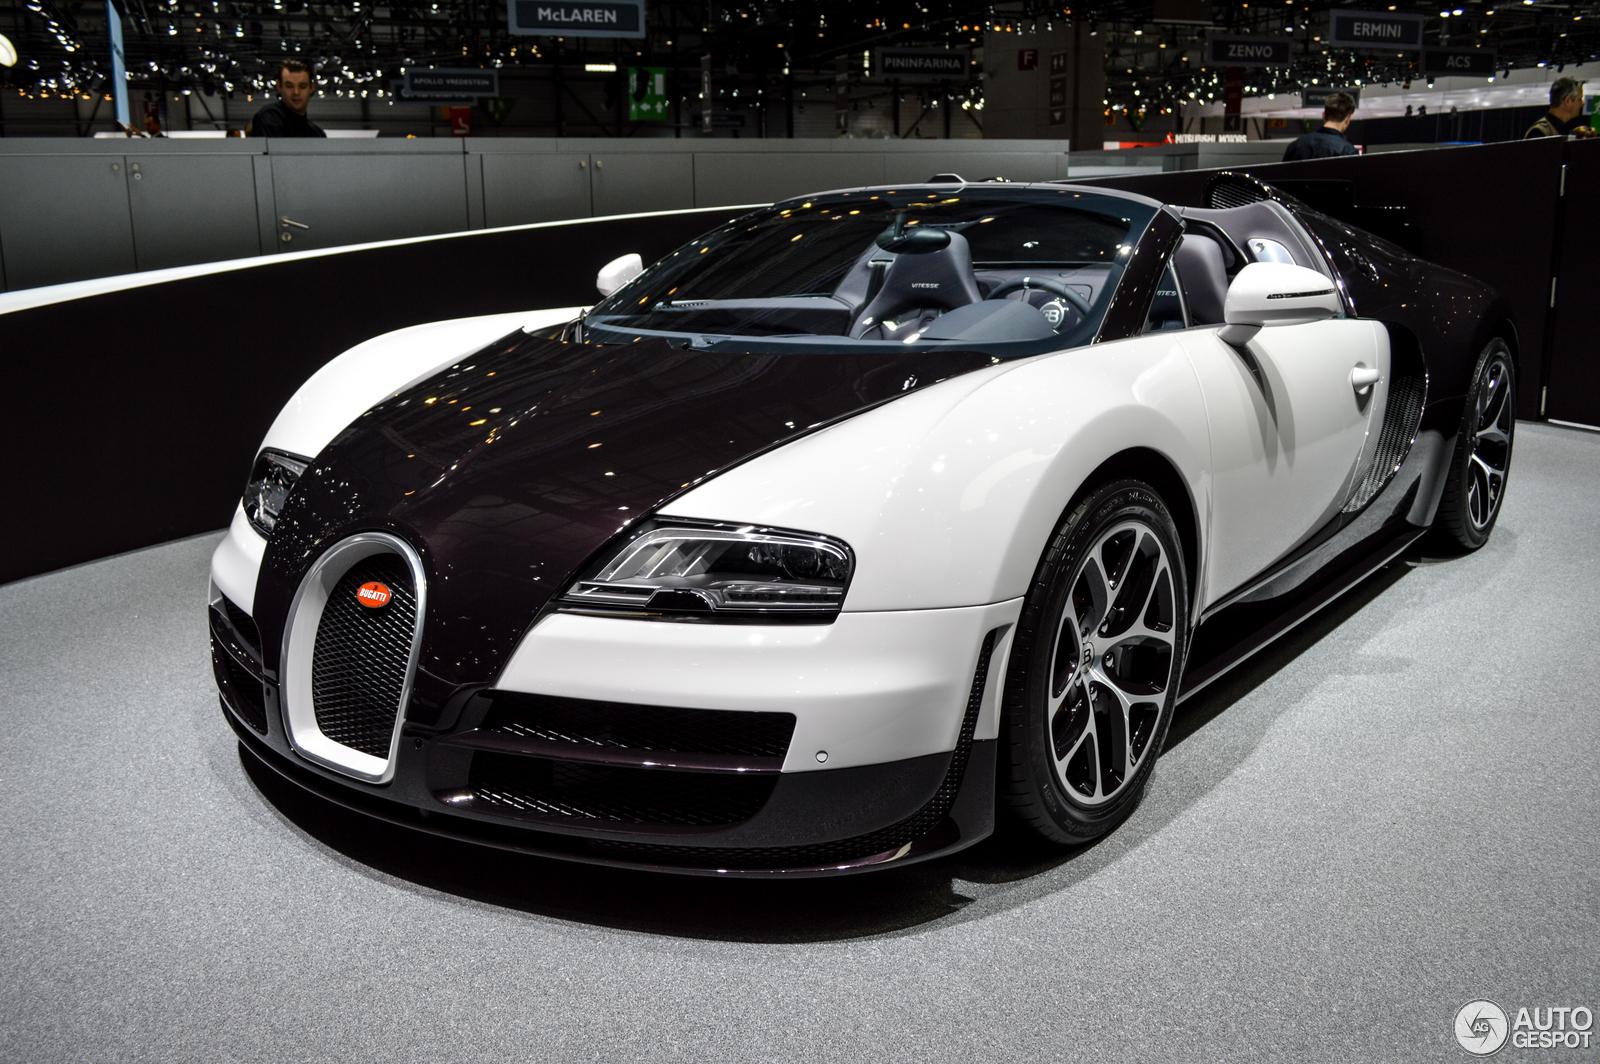 geneva 2014 bugatti veyron 16 4 grand sport vitesse. Black Bedroom Furniture Sets. Home Design Ideas